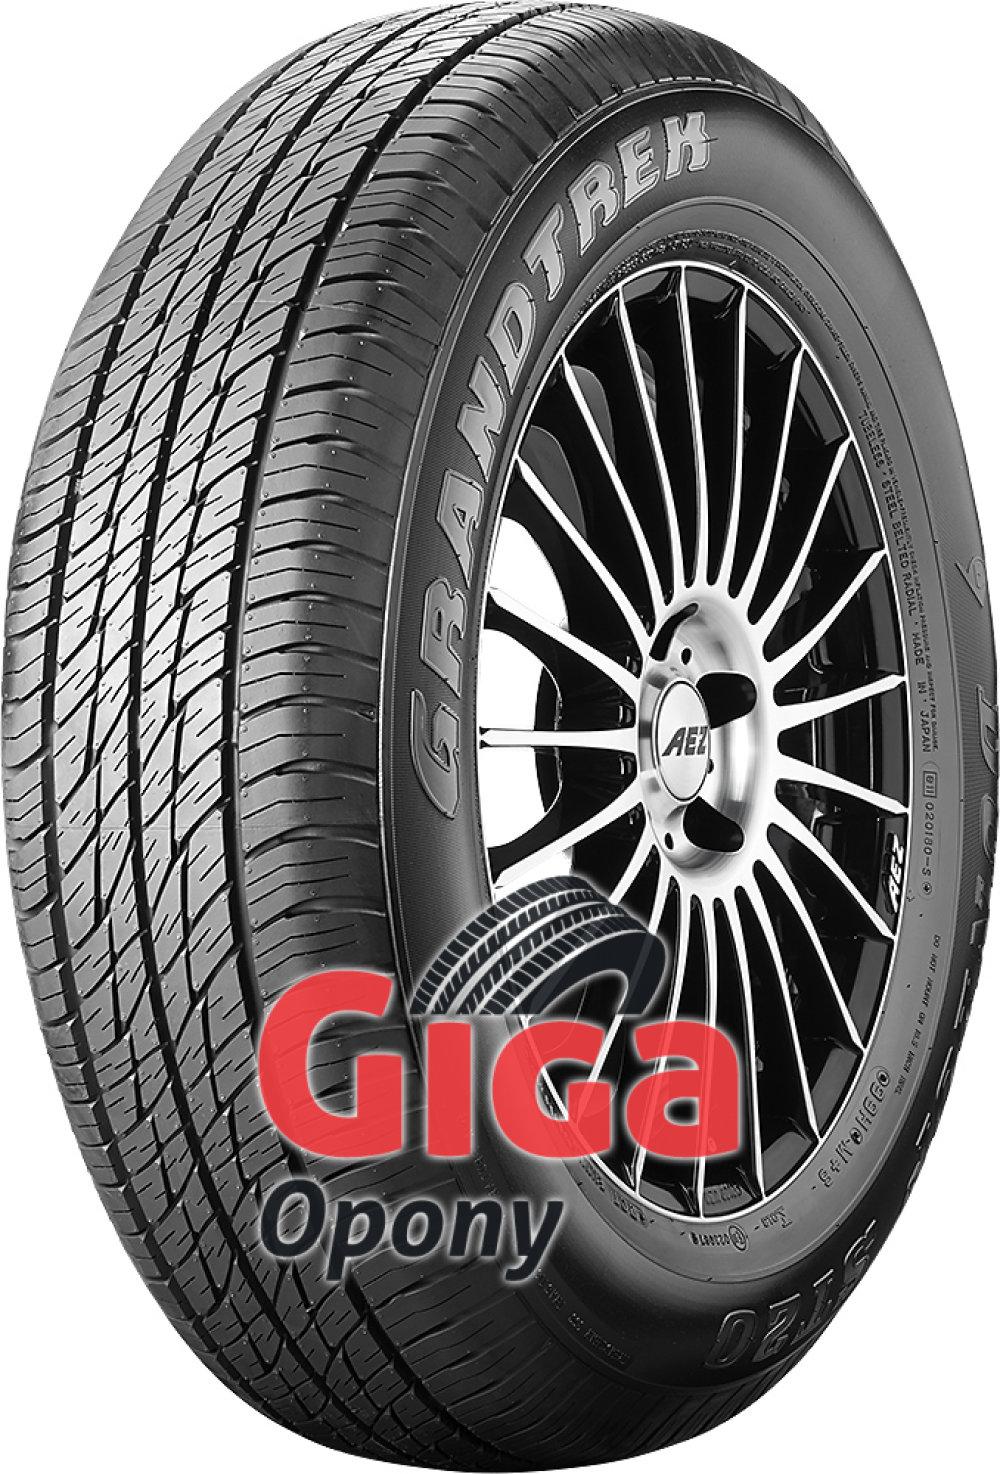 Dunlop Grandtrek ST 20 ( 215/60 R17 96H , osłona felgi (MFS) )